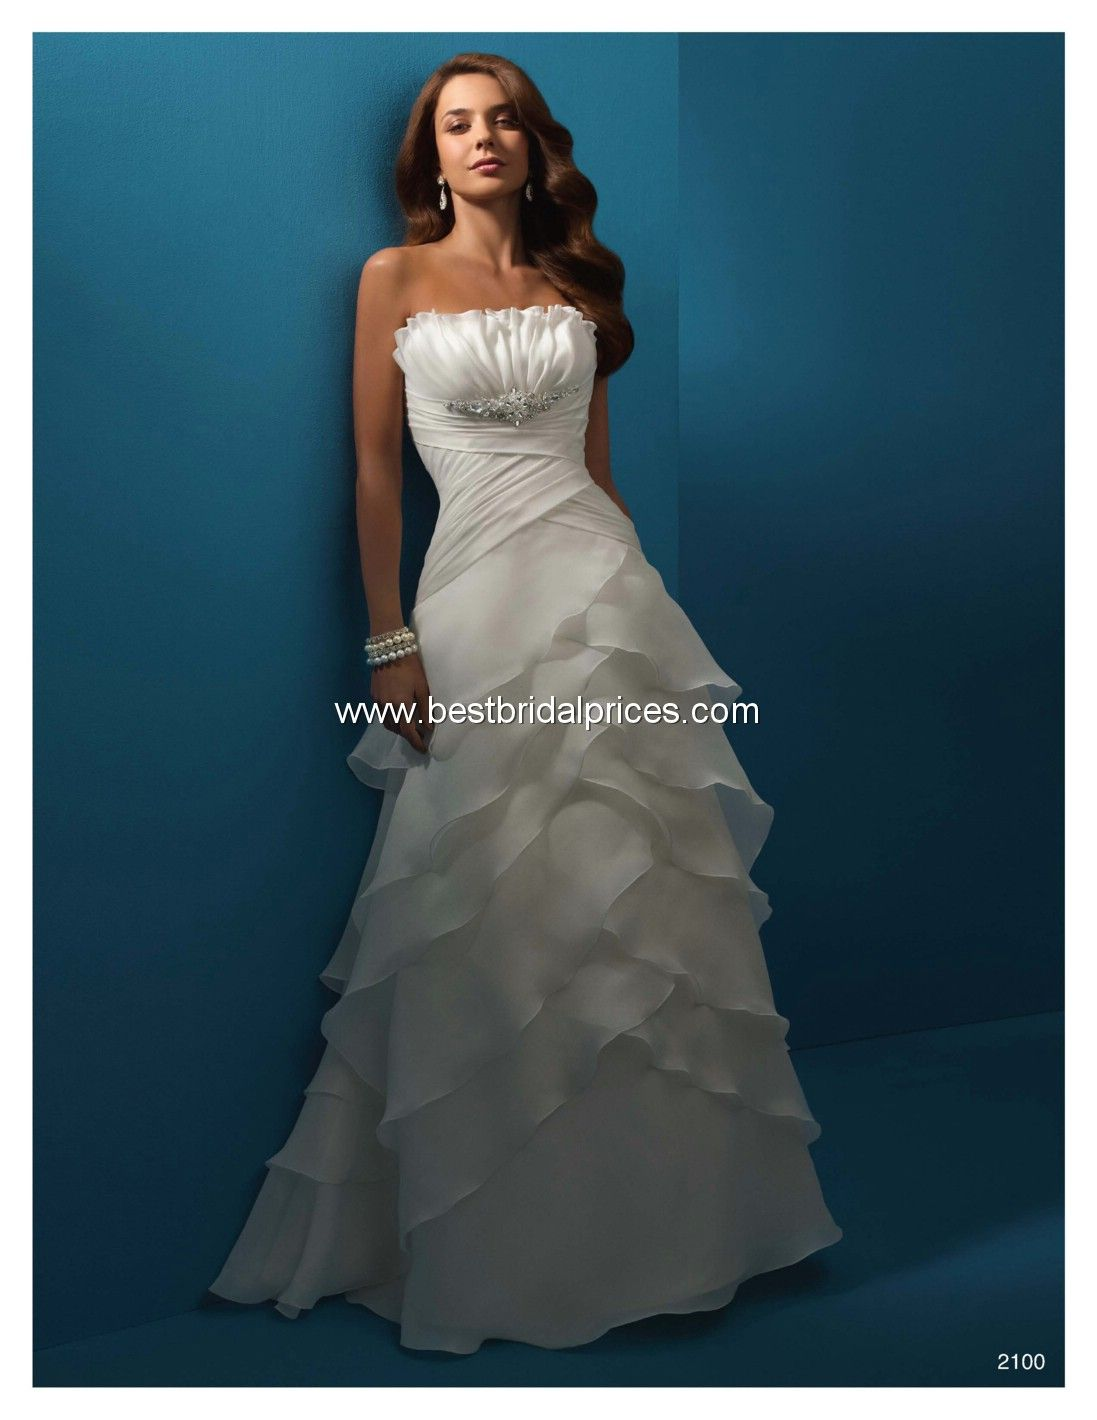 Pin By Kelly Nicolas On Wedding Dresses Alfred Angelo Wedding Dress Wedding Dresses Chiffon Wedding Dress Beach [ 1420 x 1097 Pixel ]